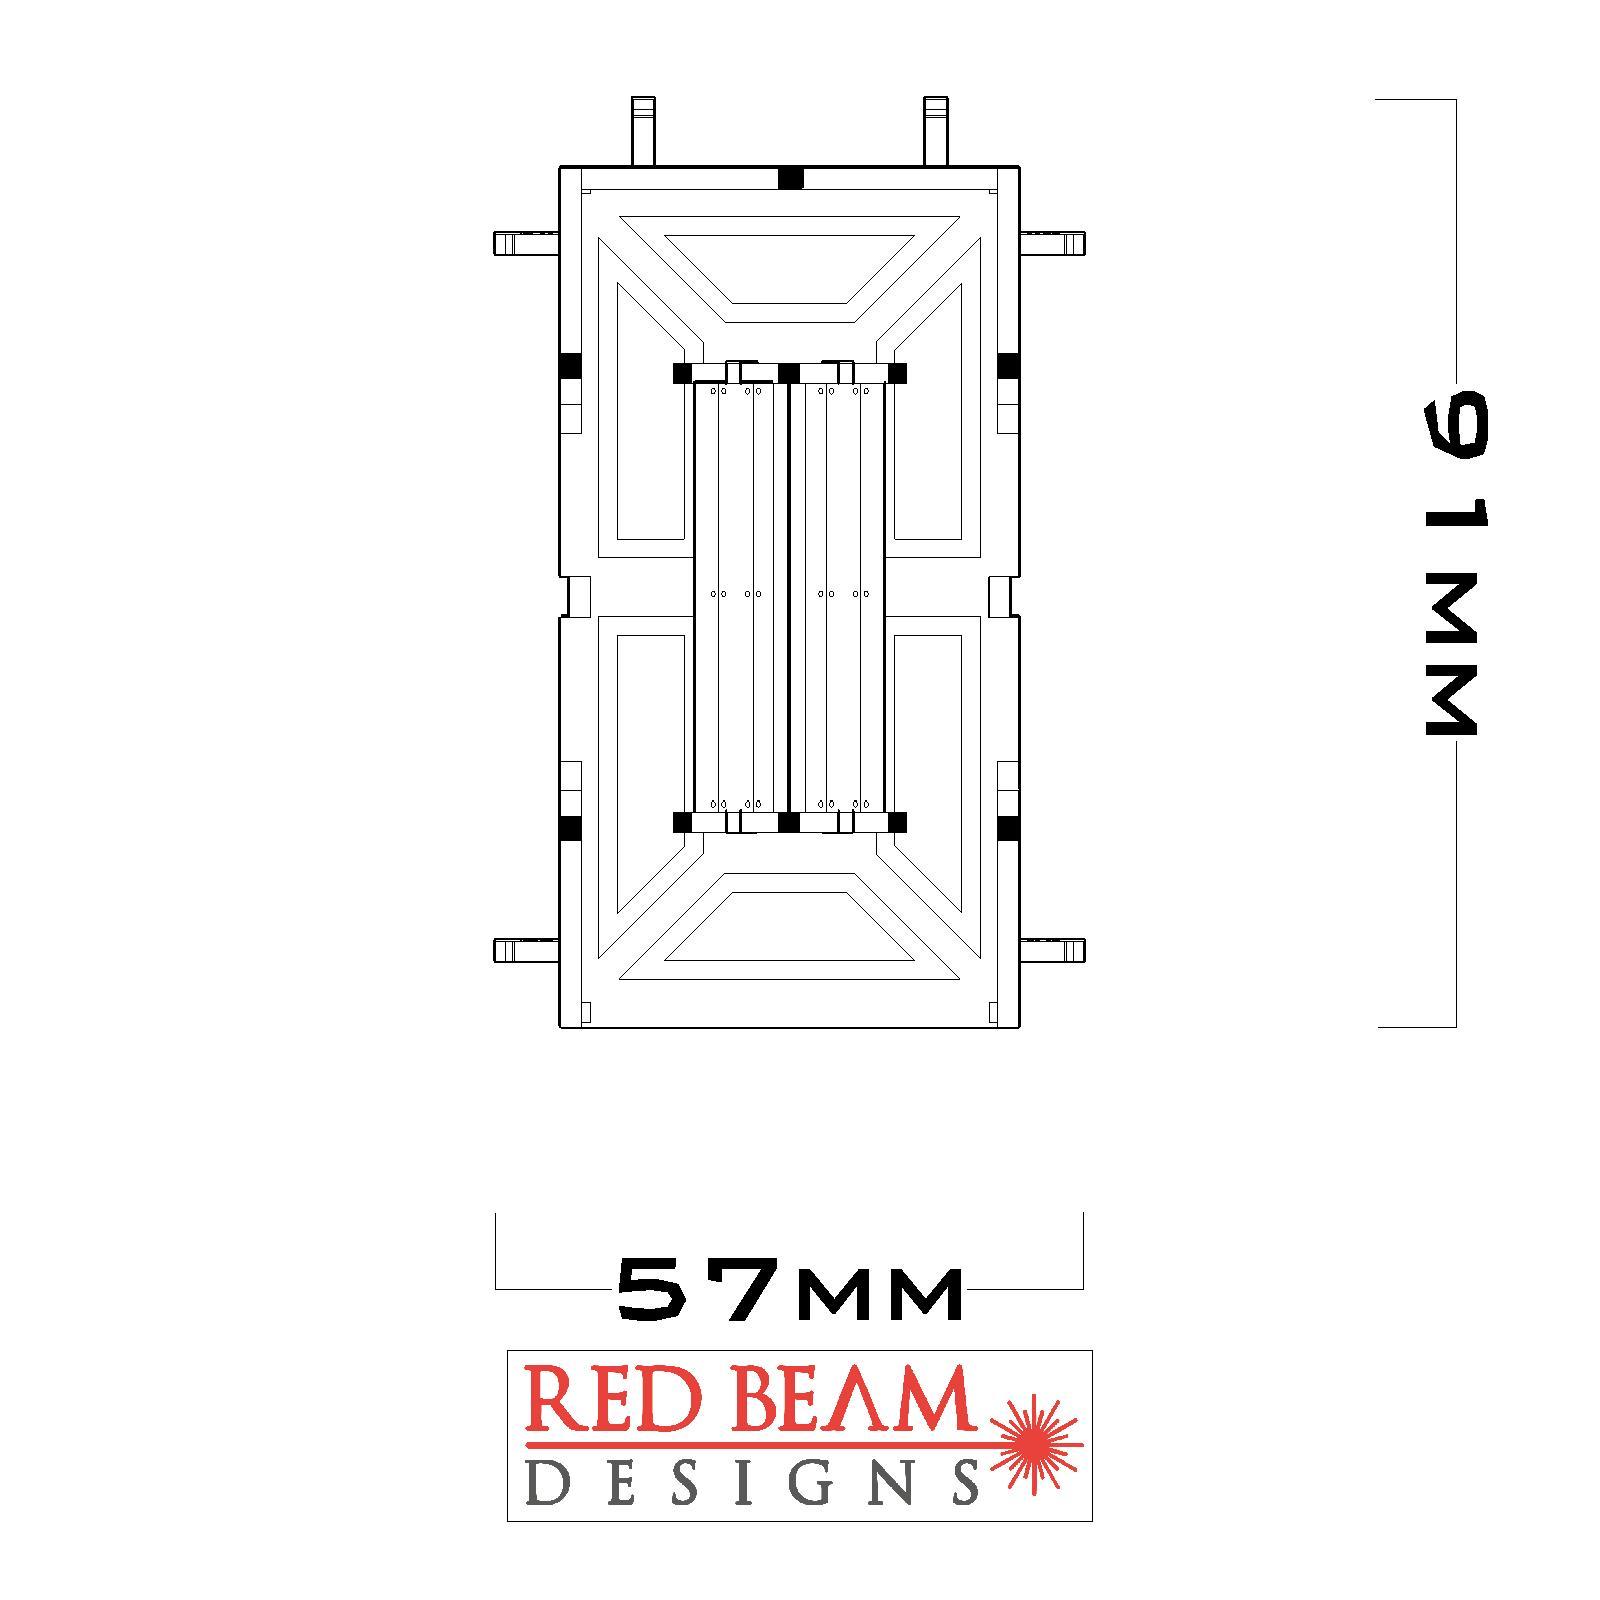 RBD081002_RENDER003.jpg